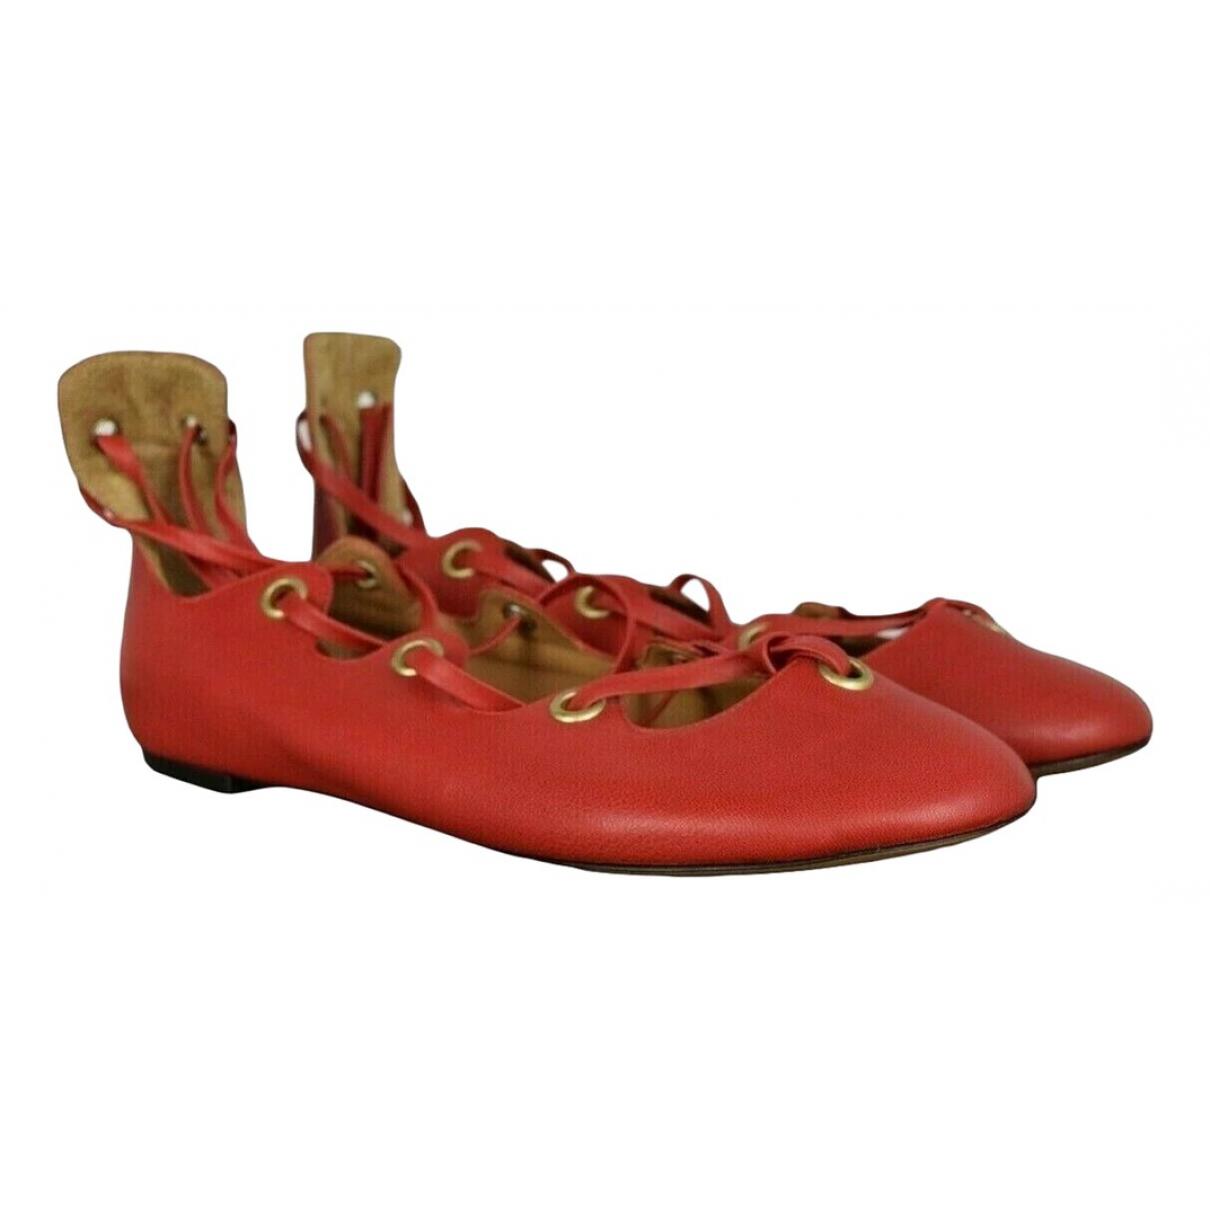 Isabel Marant \N Red Leather Ballet flats for Women 36 EU